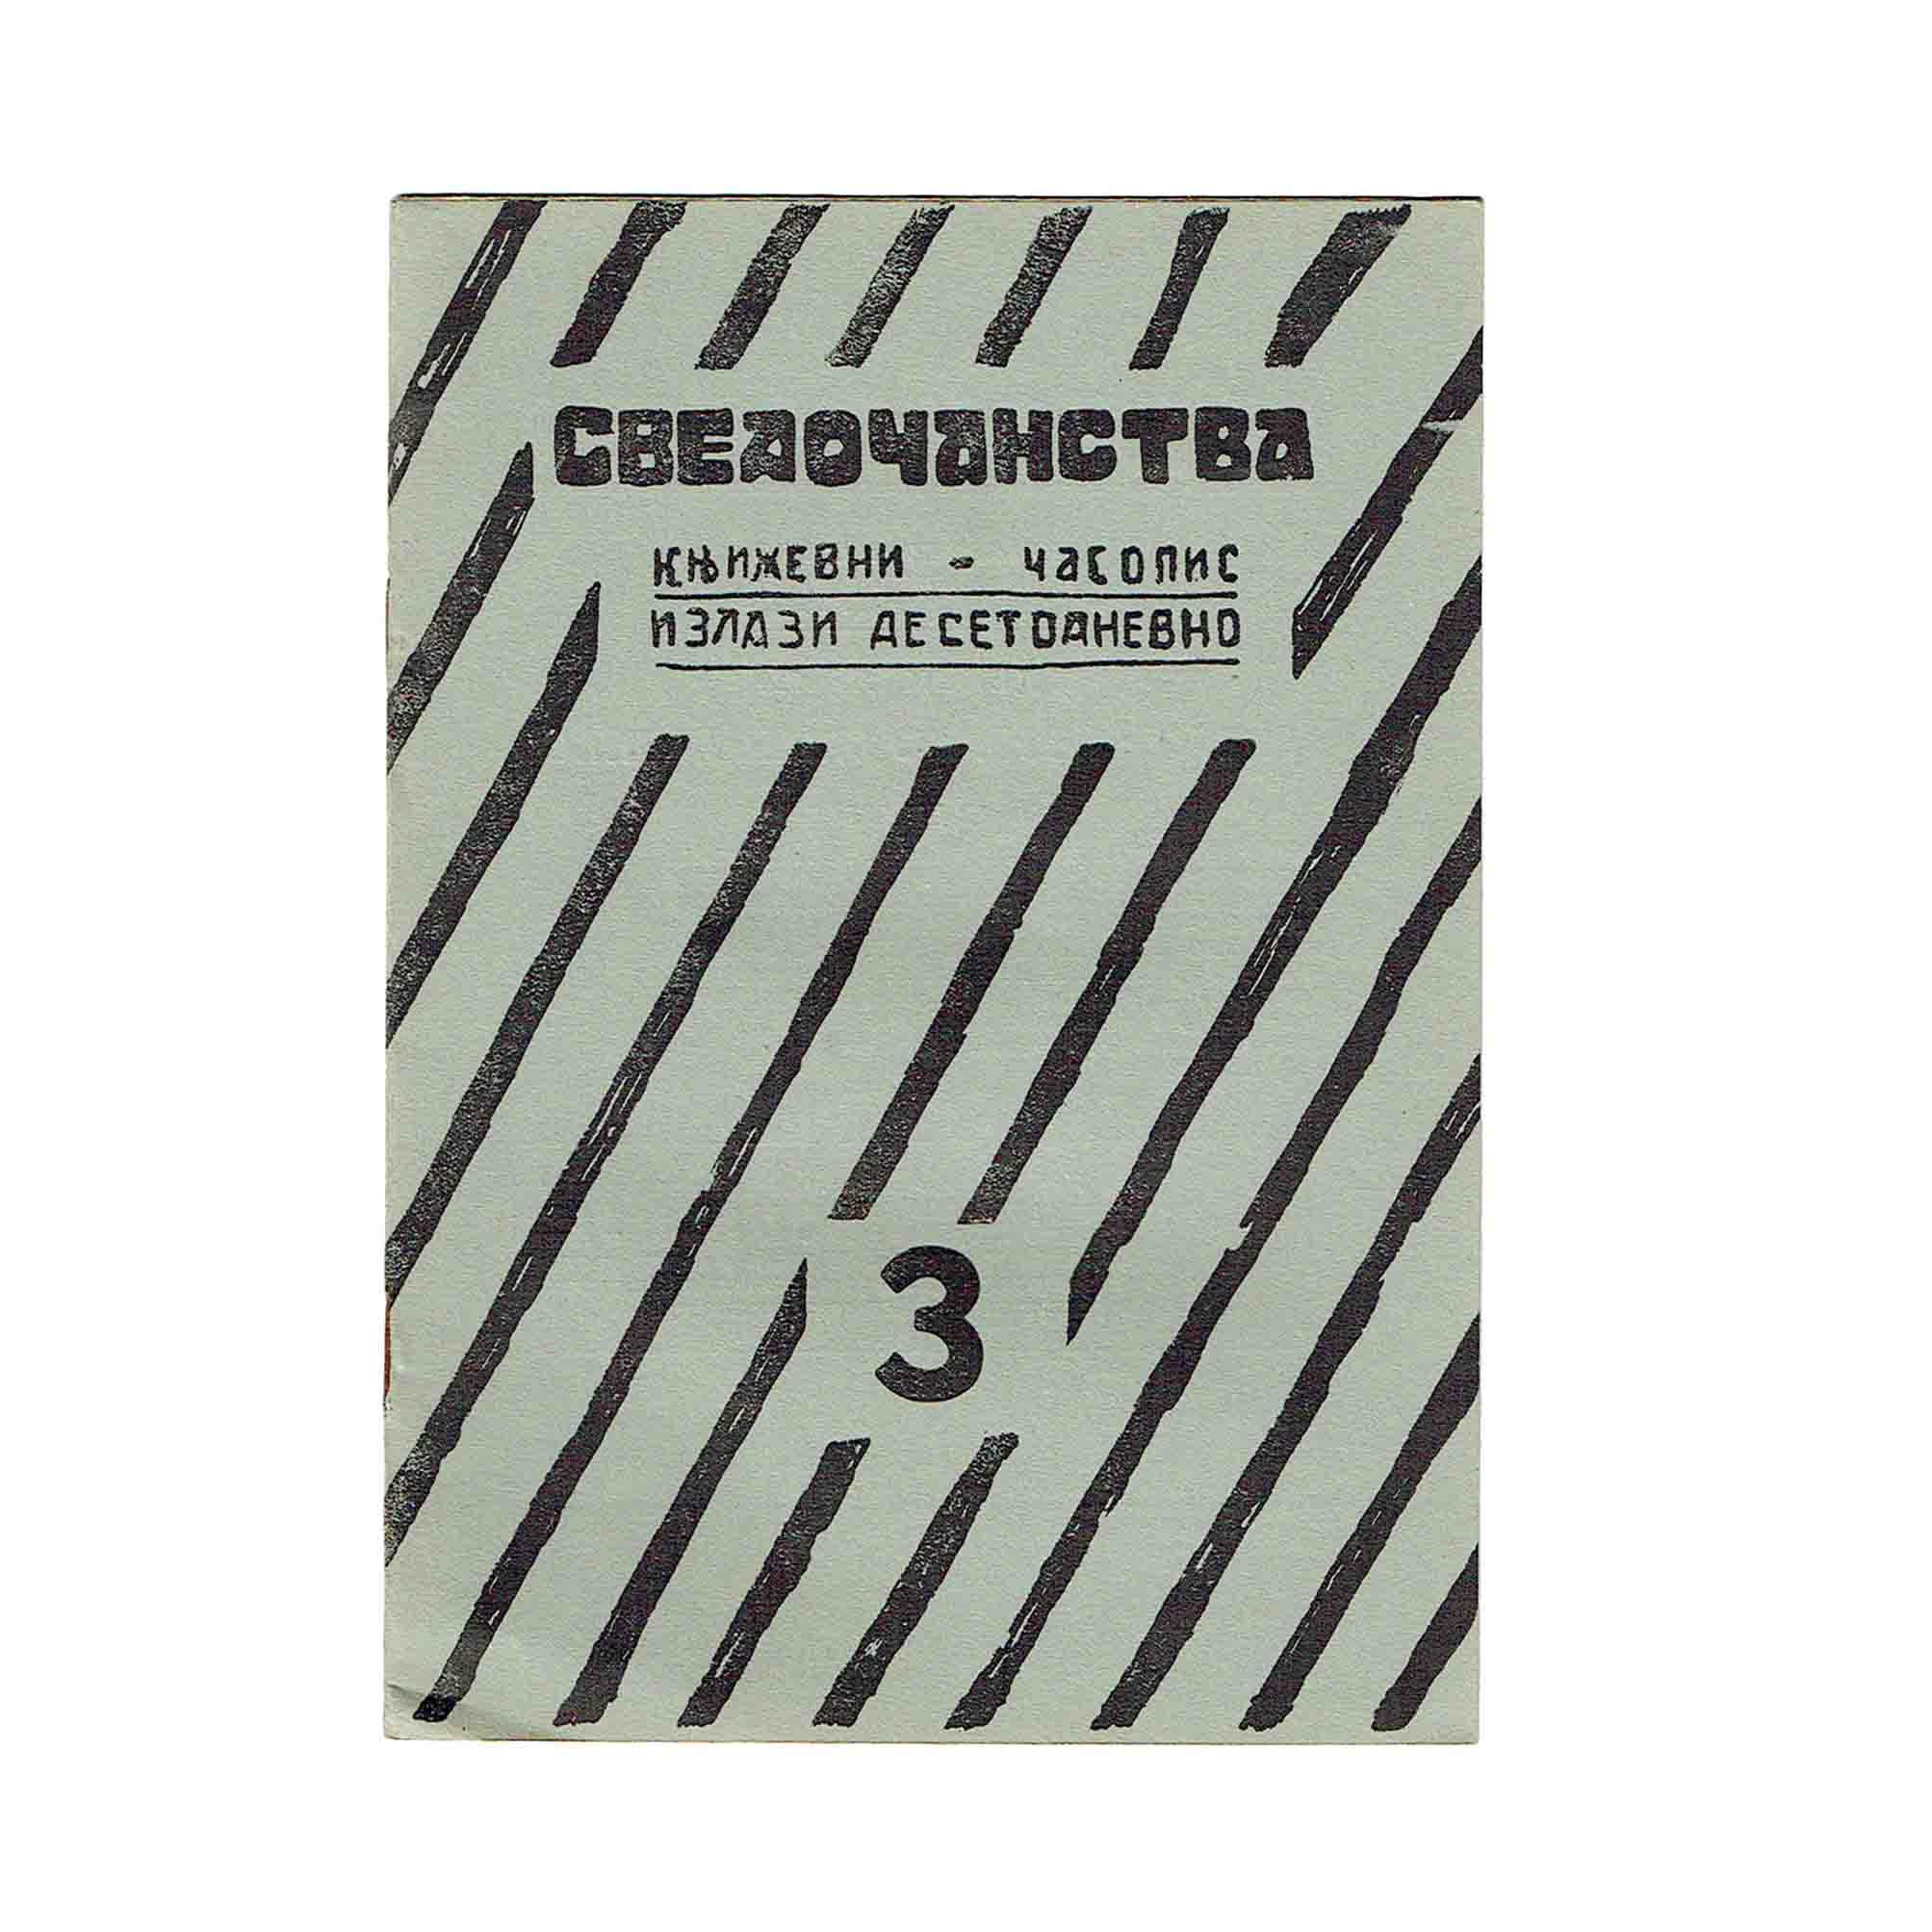 Svedocanstva-3-1924-Cover-recto-frei-N.jpeg